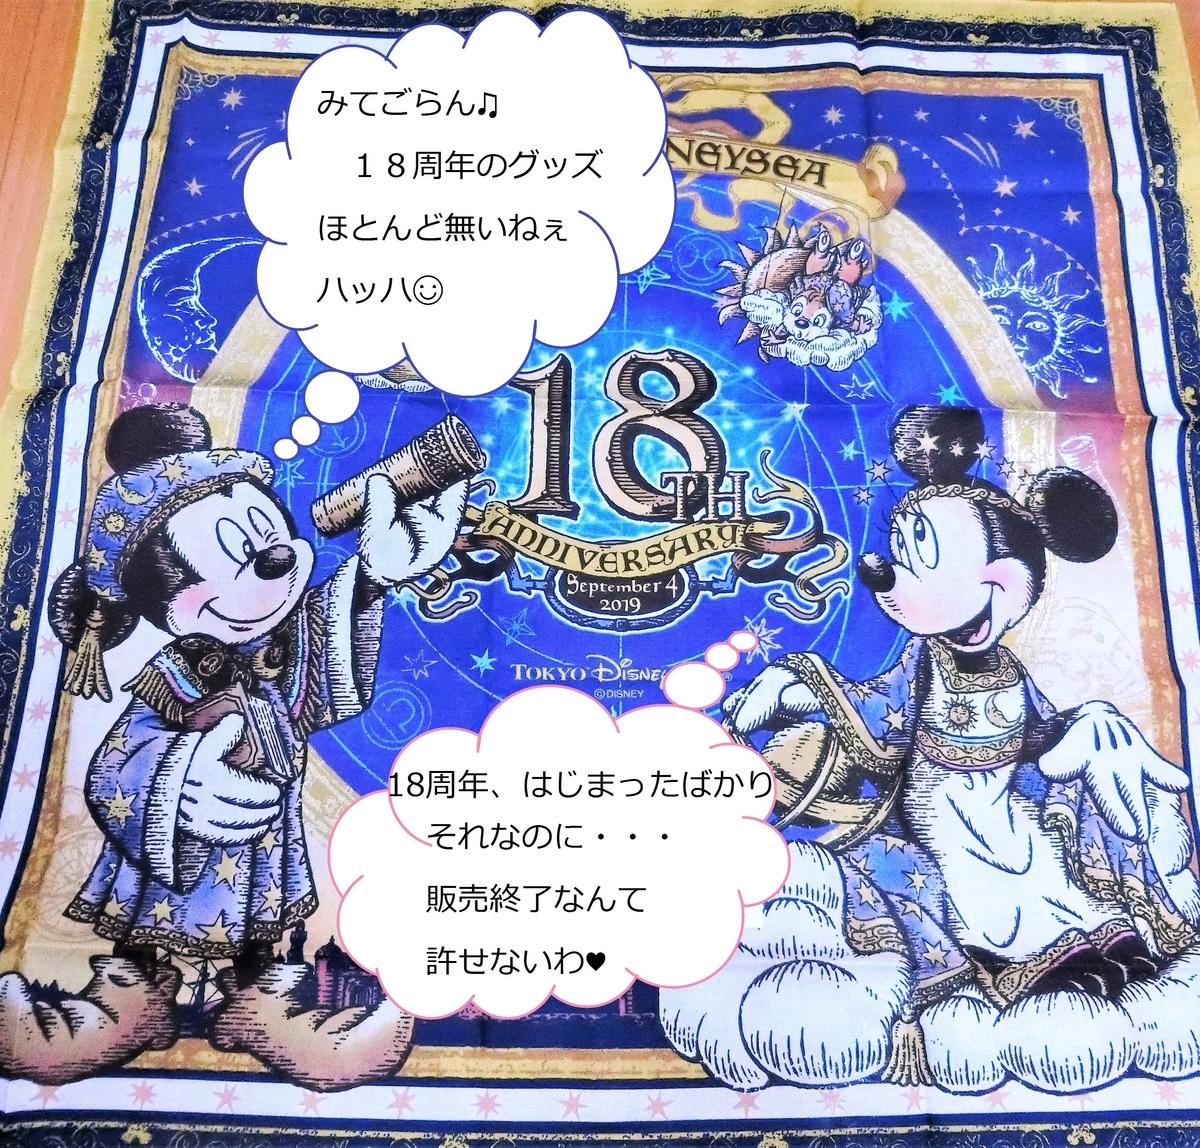 f:id:ichiko-disneyblog:20190917194224j:plain